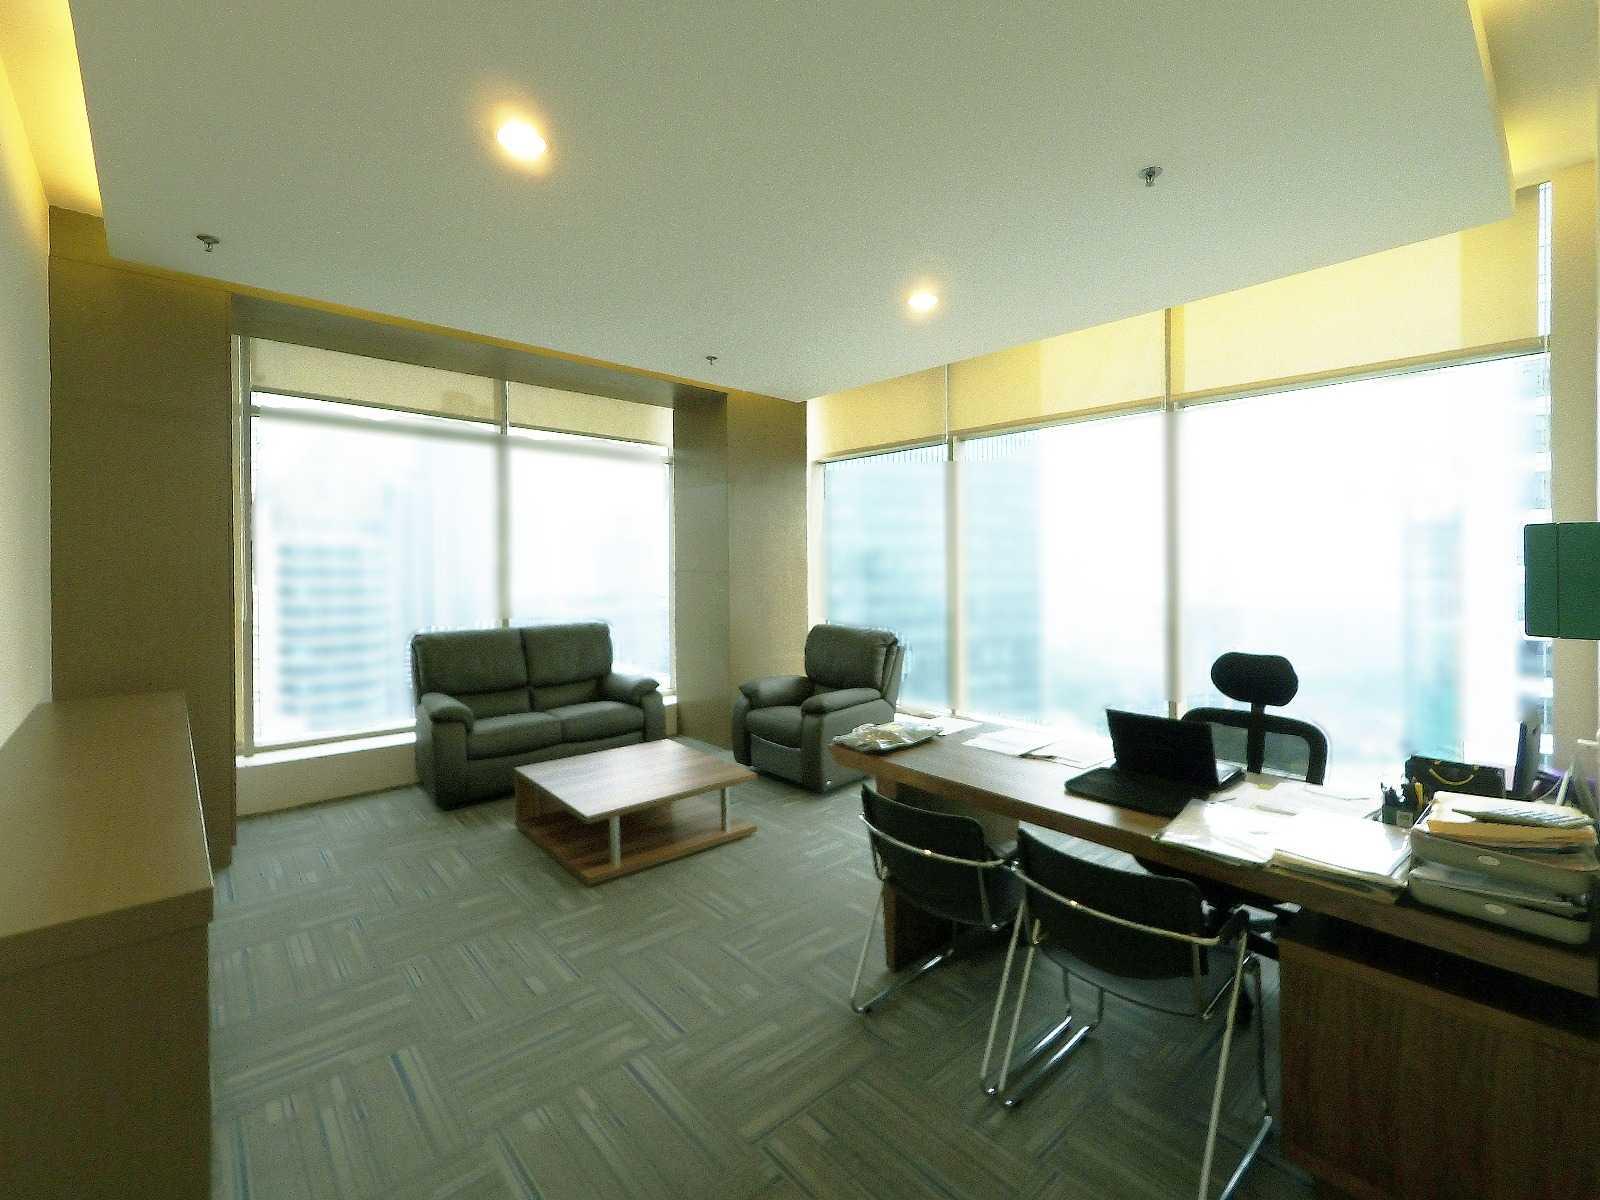 Arkadia Works Sekar Bumi Office Renovation Plaza Asia 21St Floor Plaza Asia 21St Floor Office Room   14082